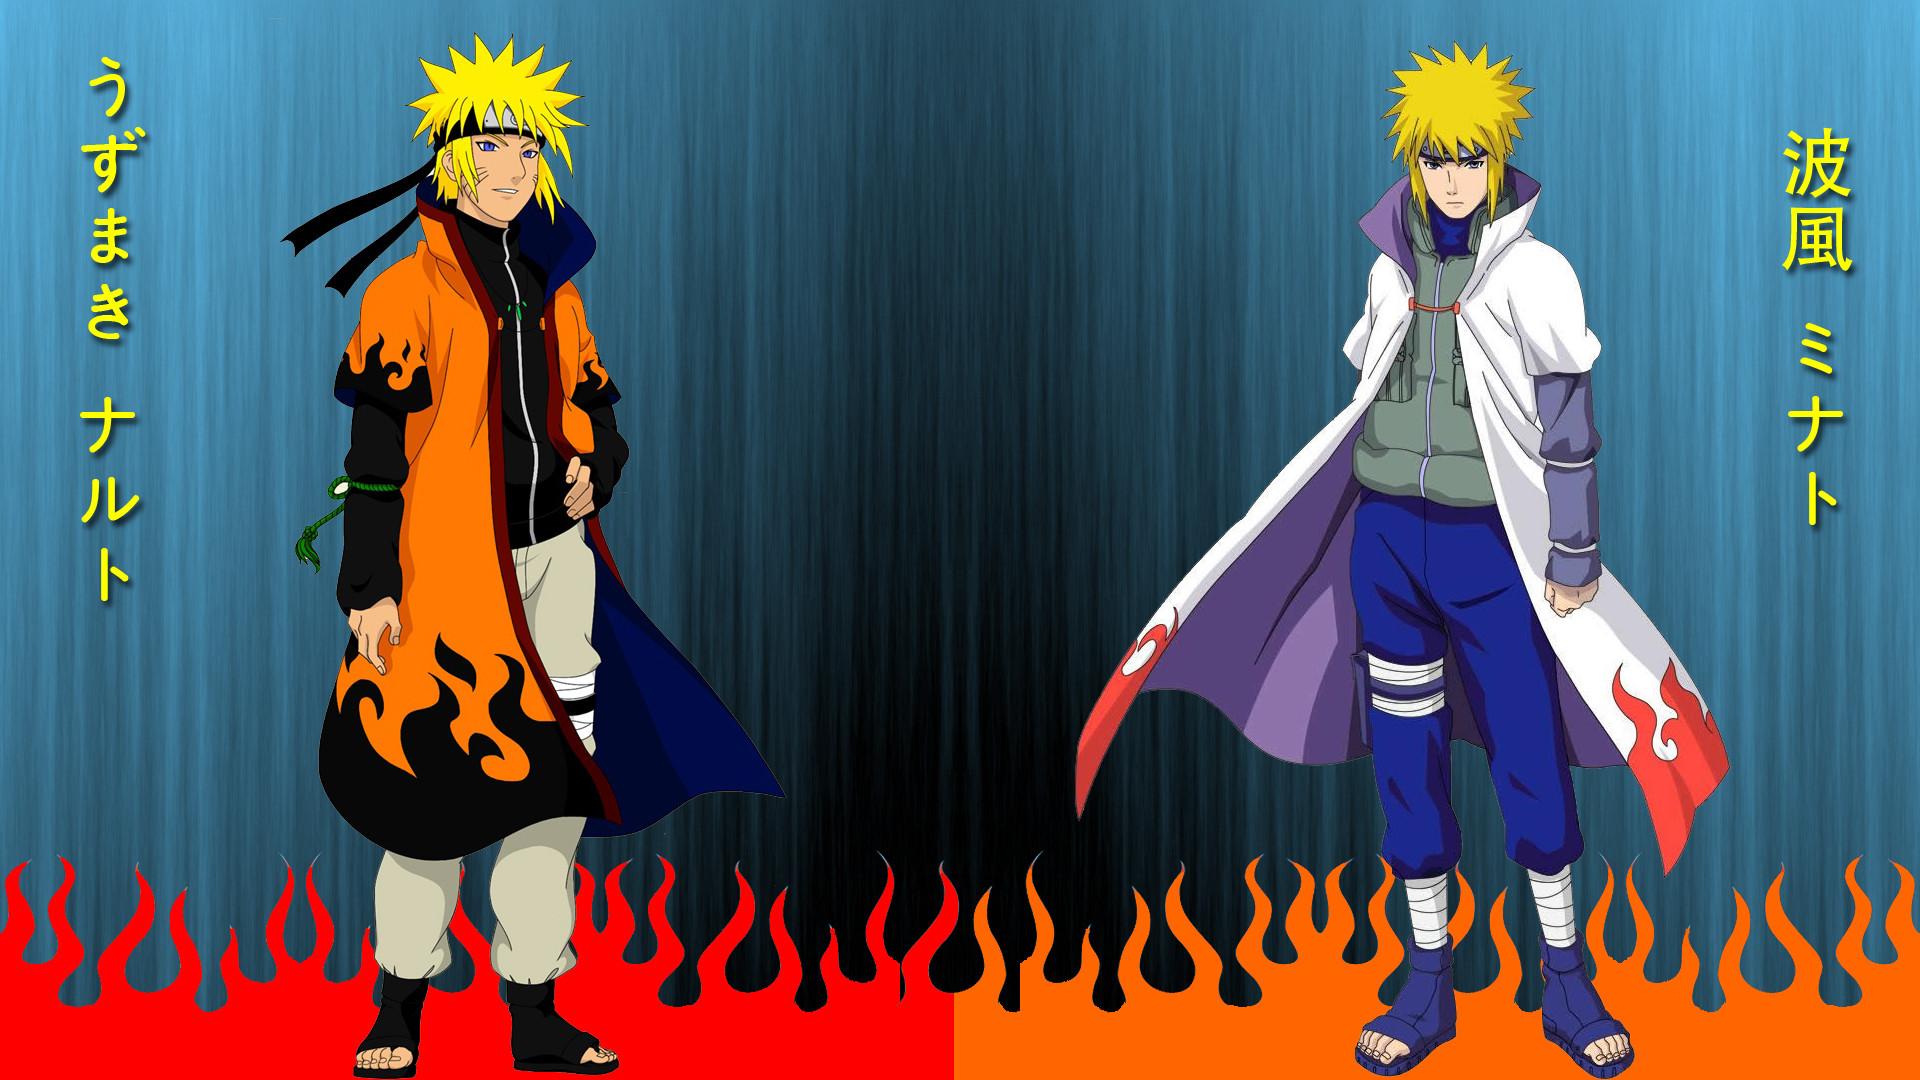 Anime Naruto HD Wallpapers 1080P Read Naruto Manga Online